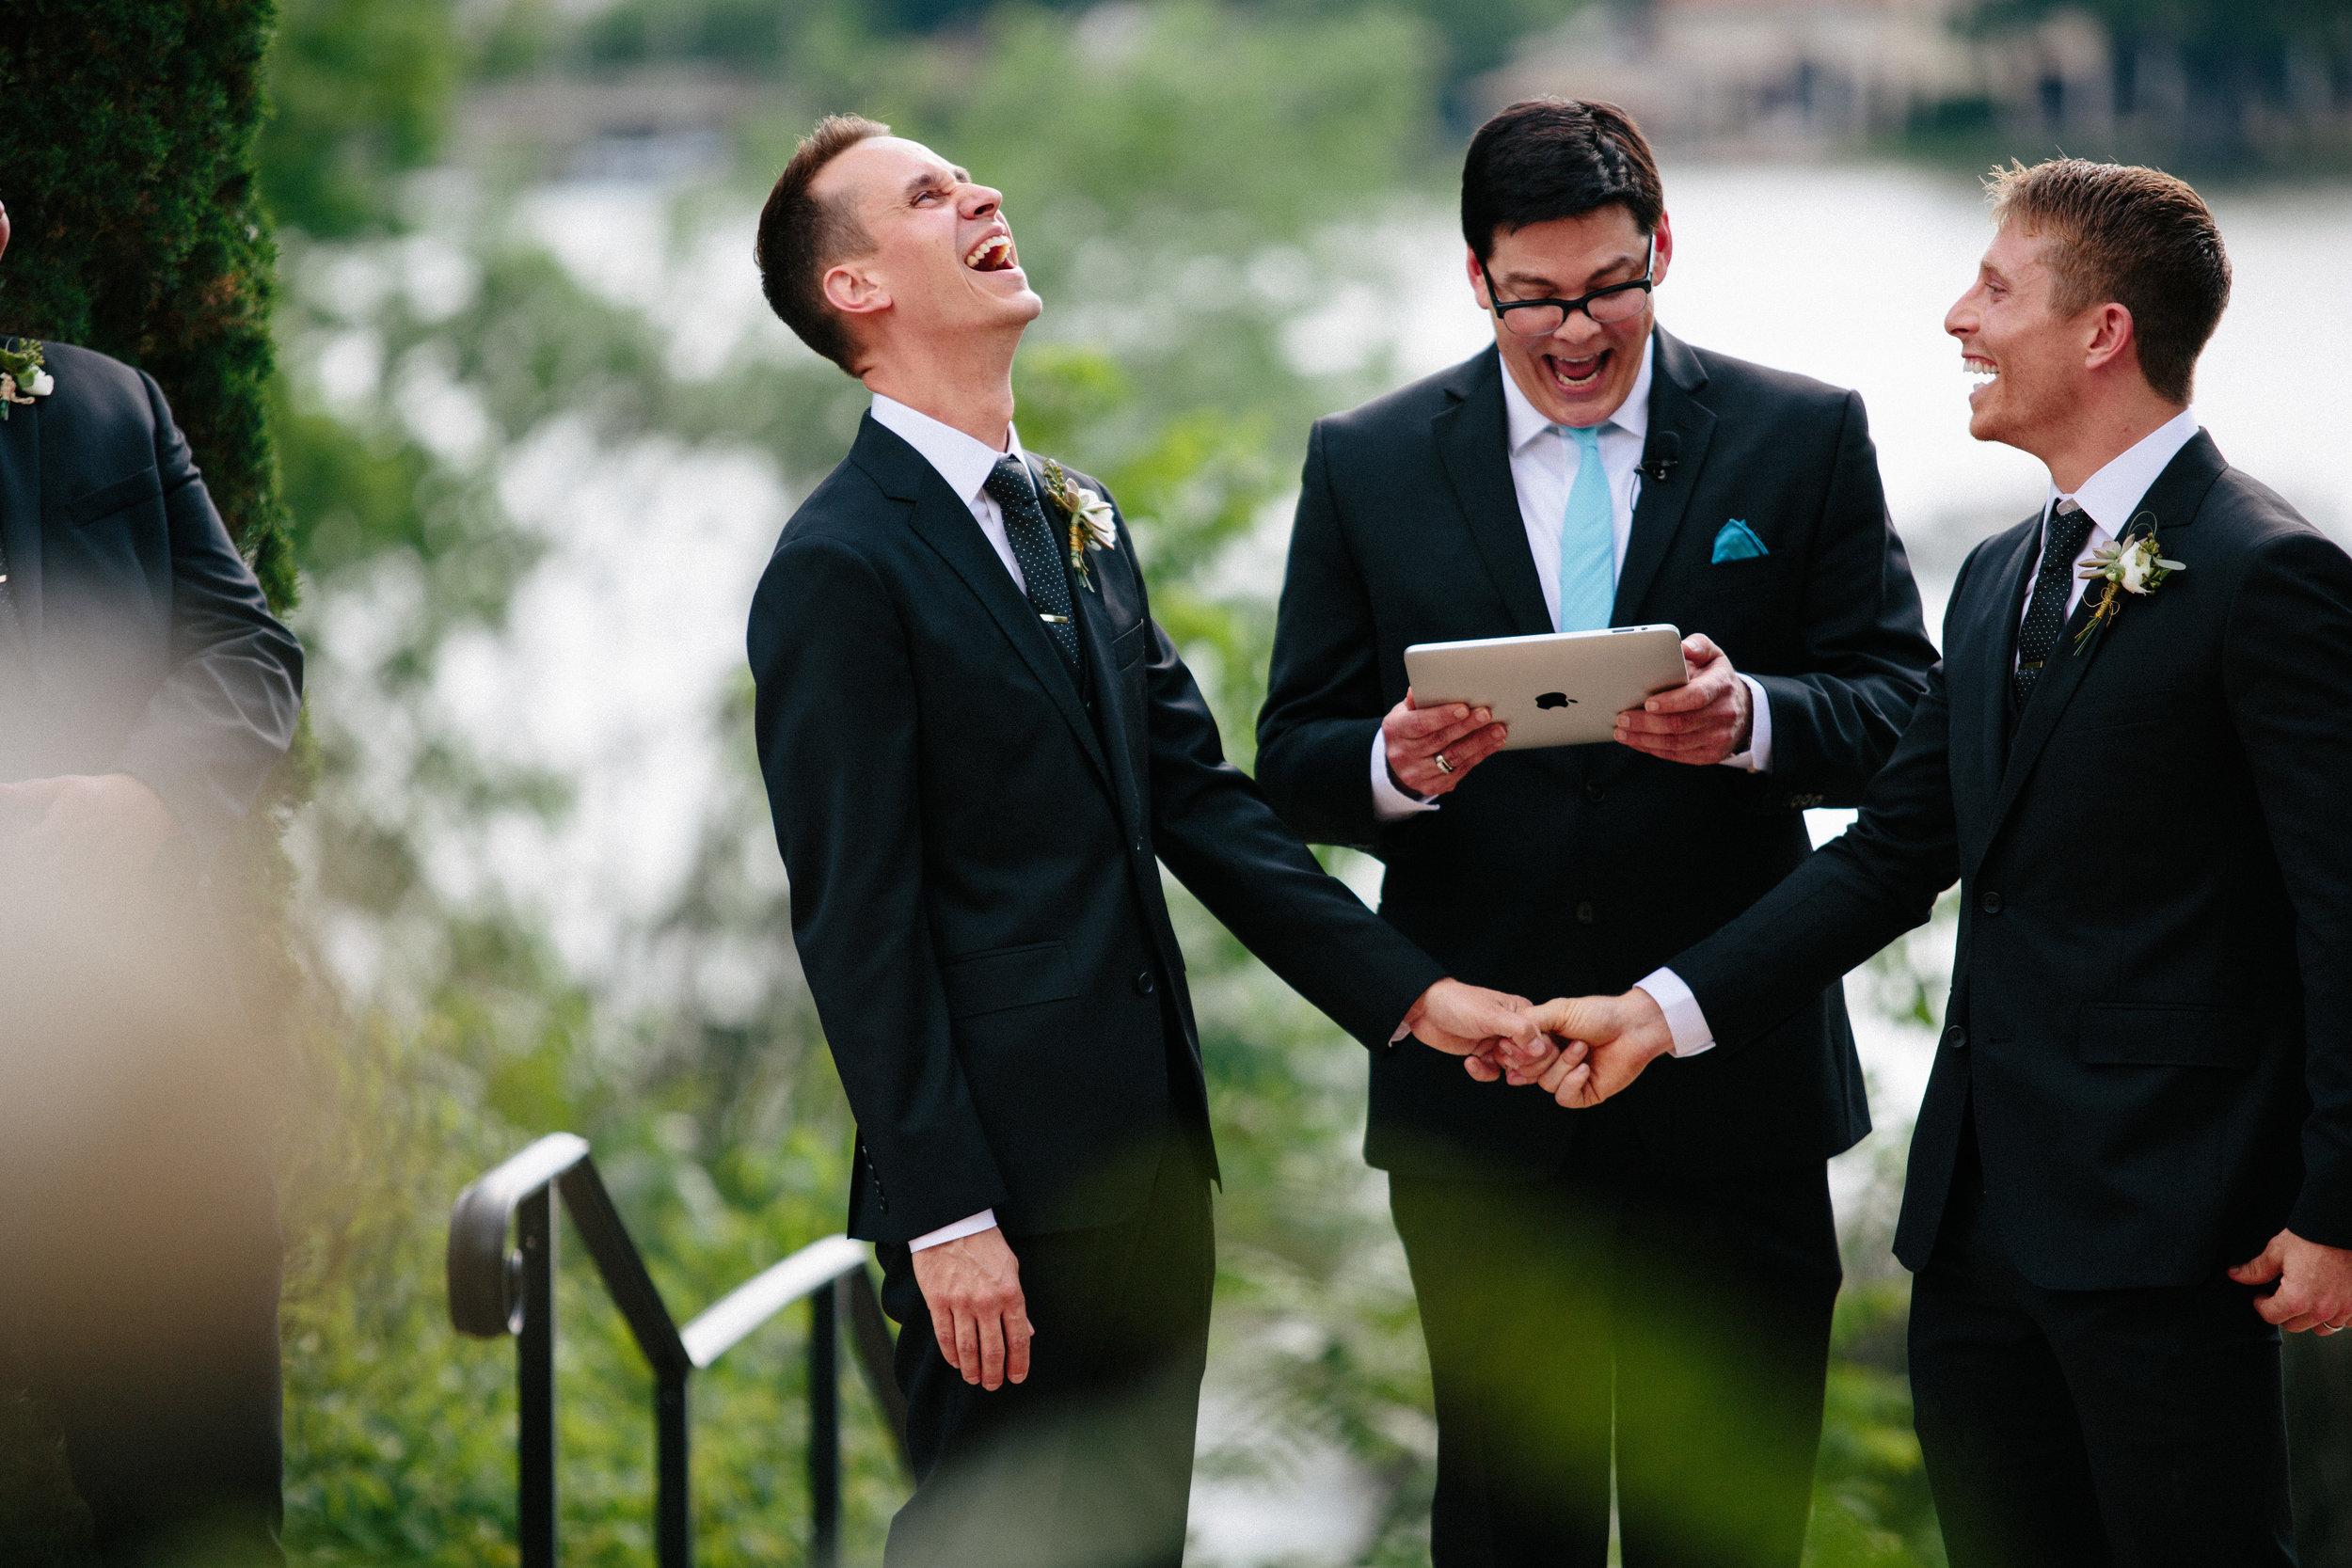 Paige-Newton-Austin-Wedding-Photography-Same-Sex-Ceremony.jpg